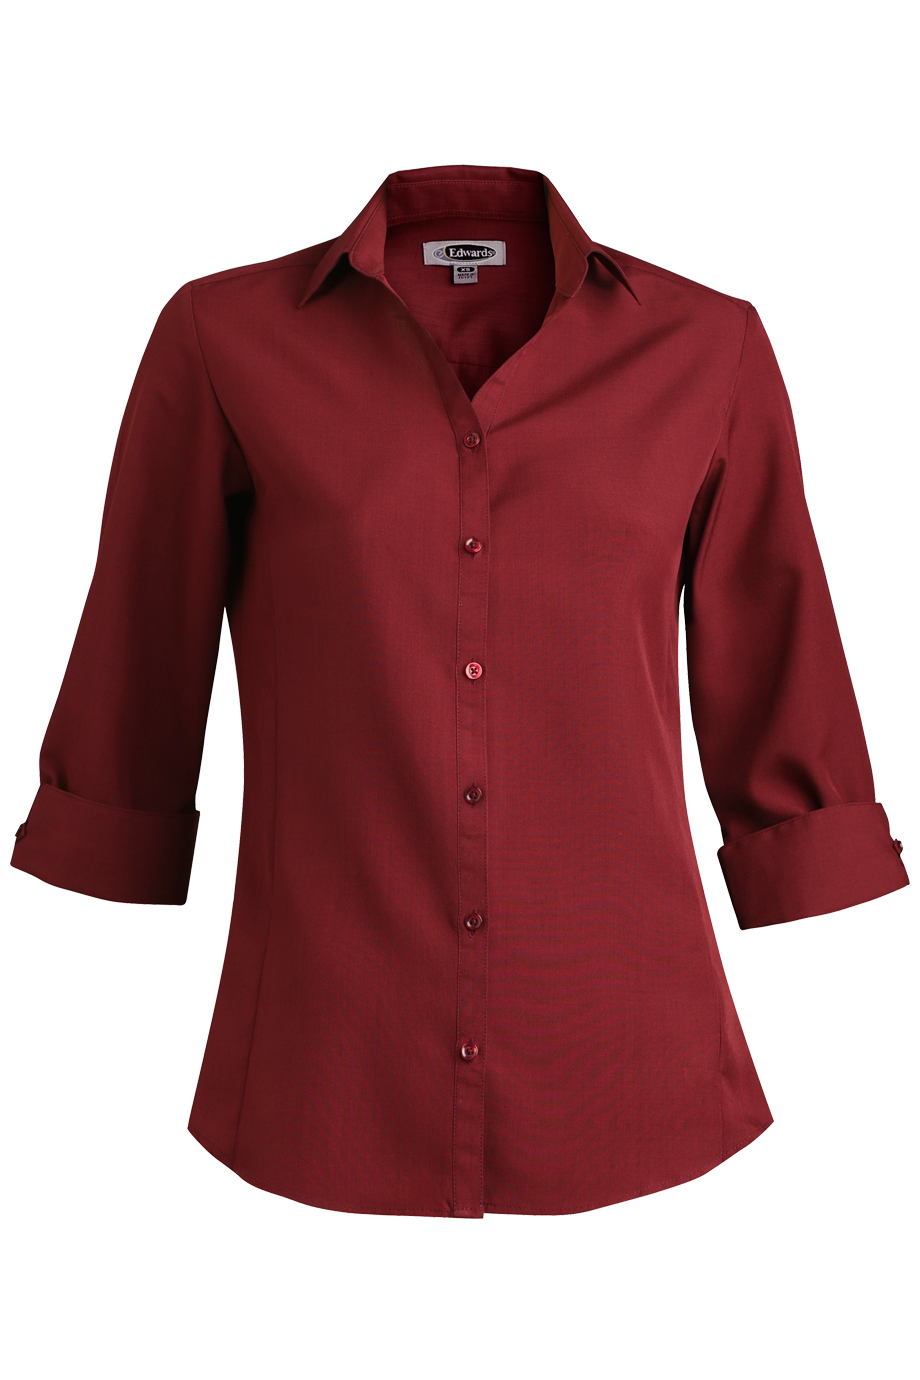 38ff23c197d1 Buy Edwards Ladies Batiste 3 4 Sleeve Blouse - Edwards Online at Best price  - TX